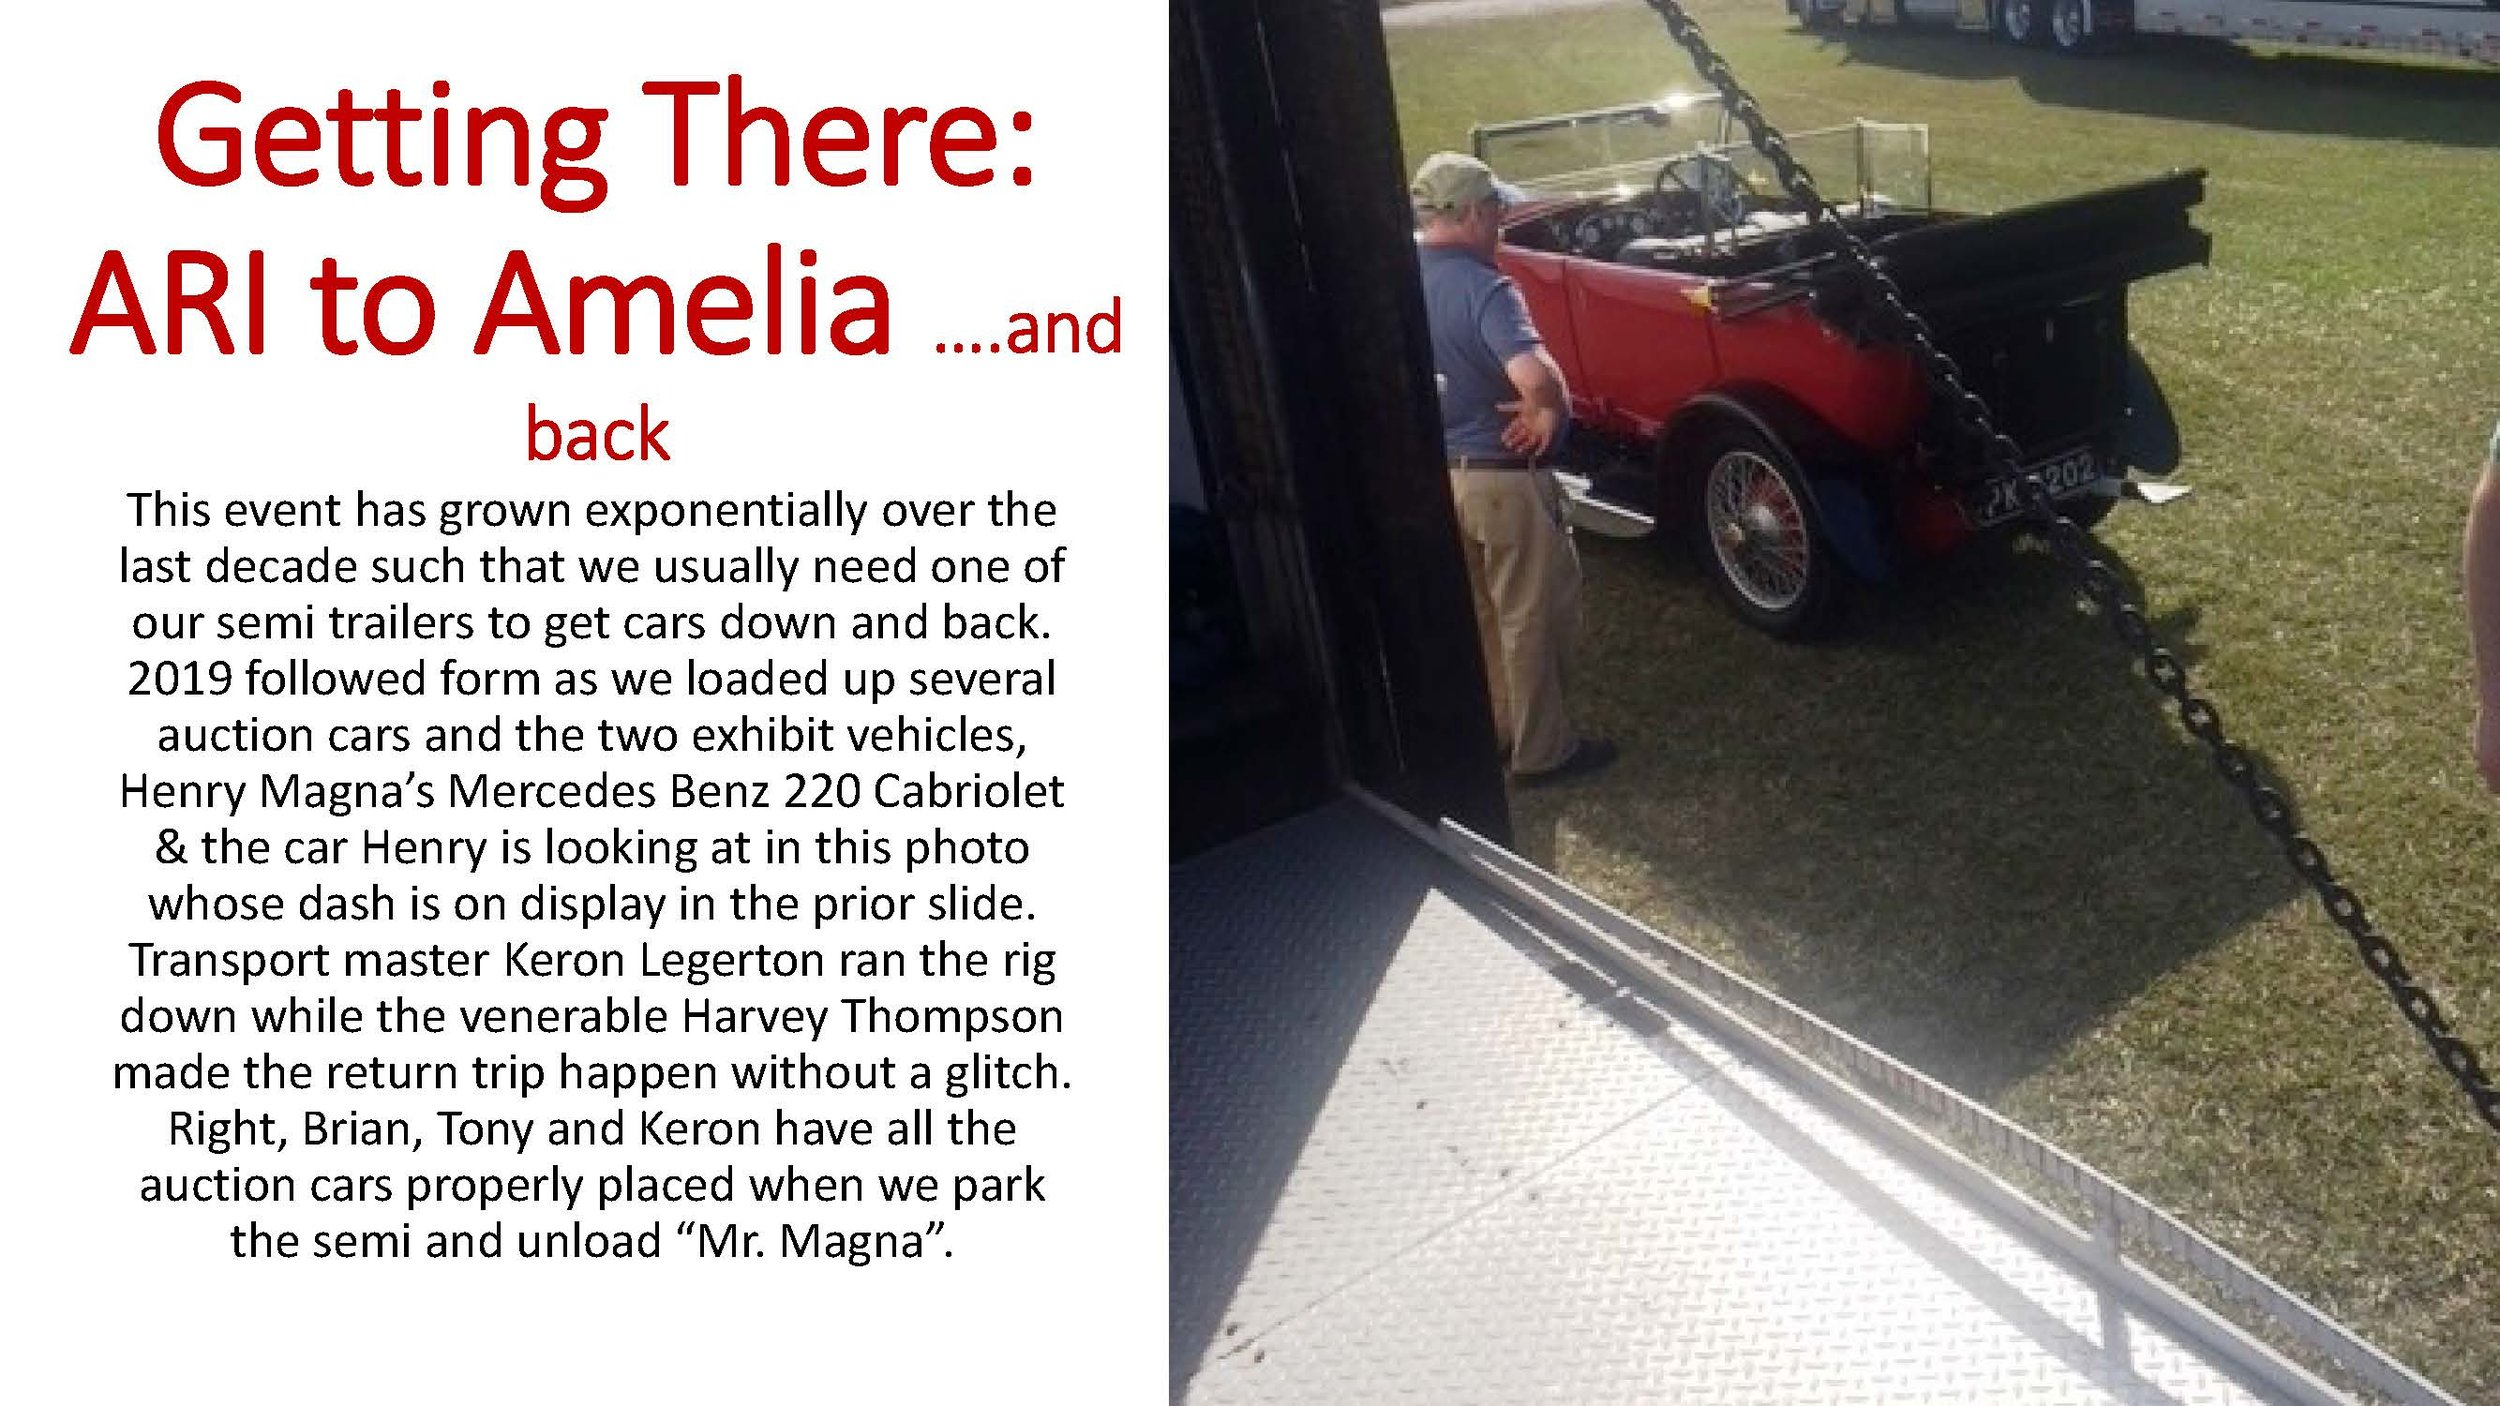 Amelia 2019 fnl_Page_2.jpg